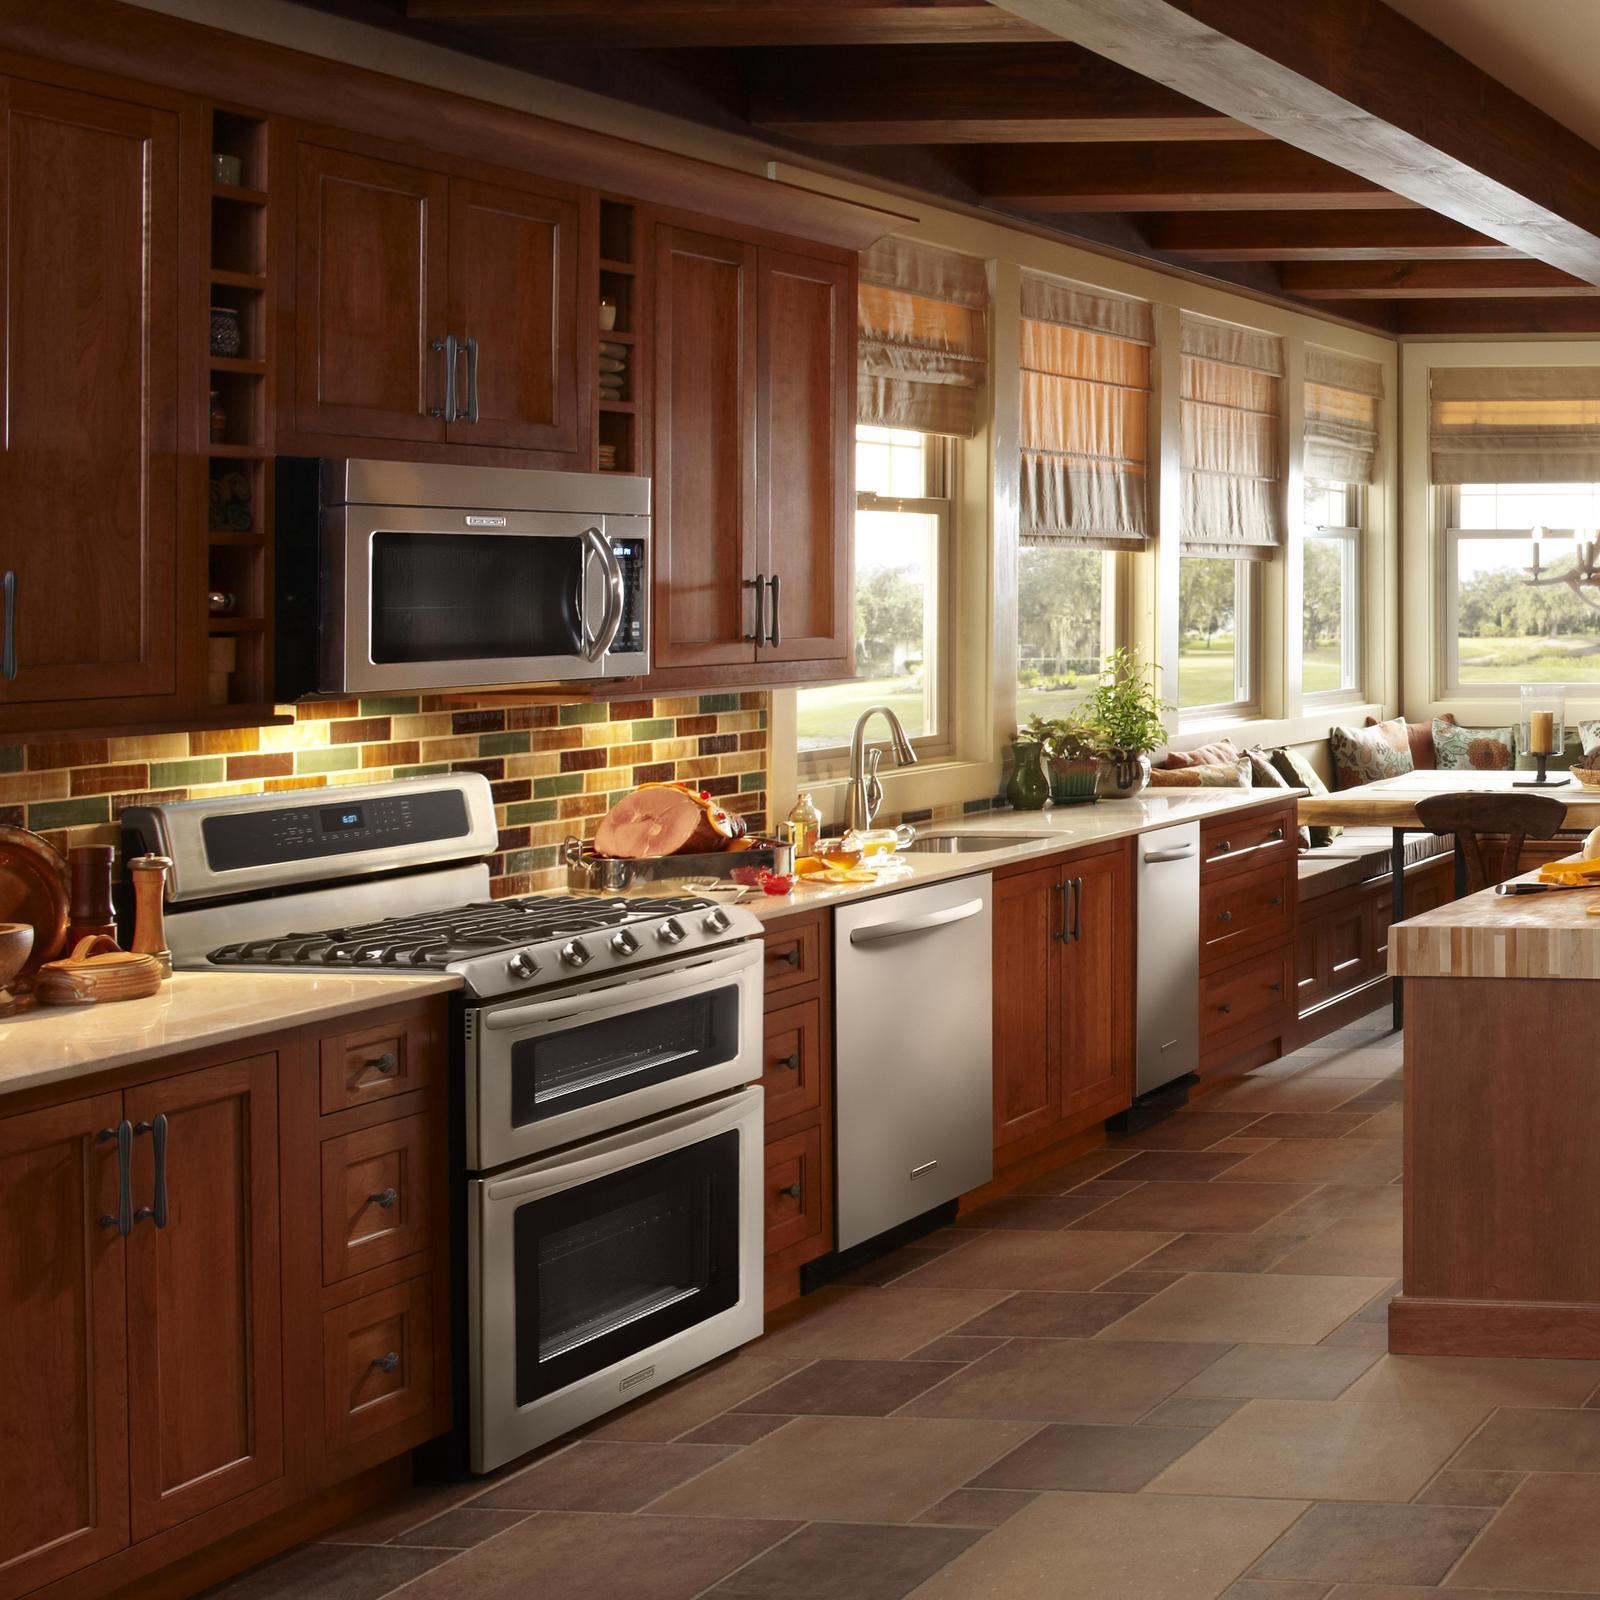 kitchenaid architect series ii kgrs505xss stove img 2